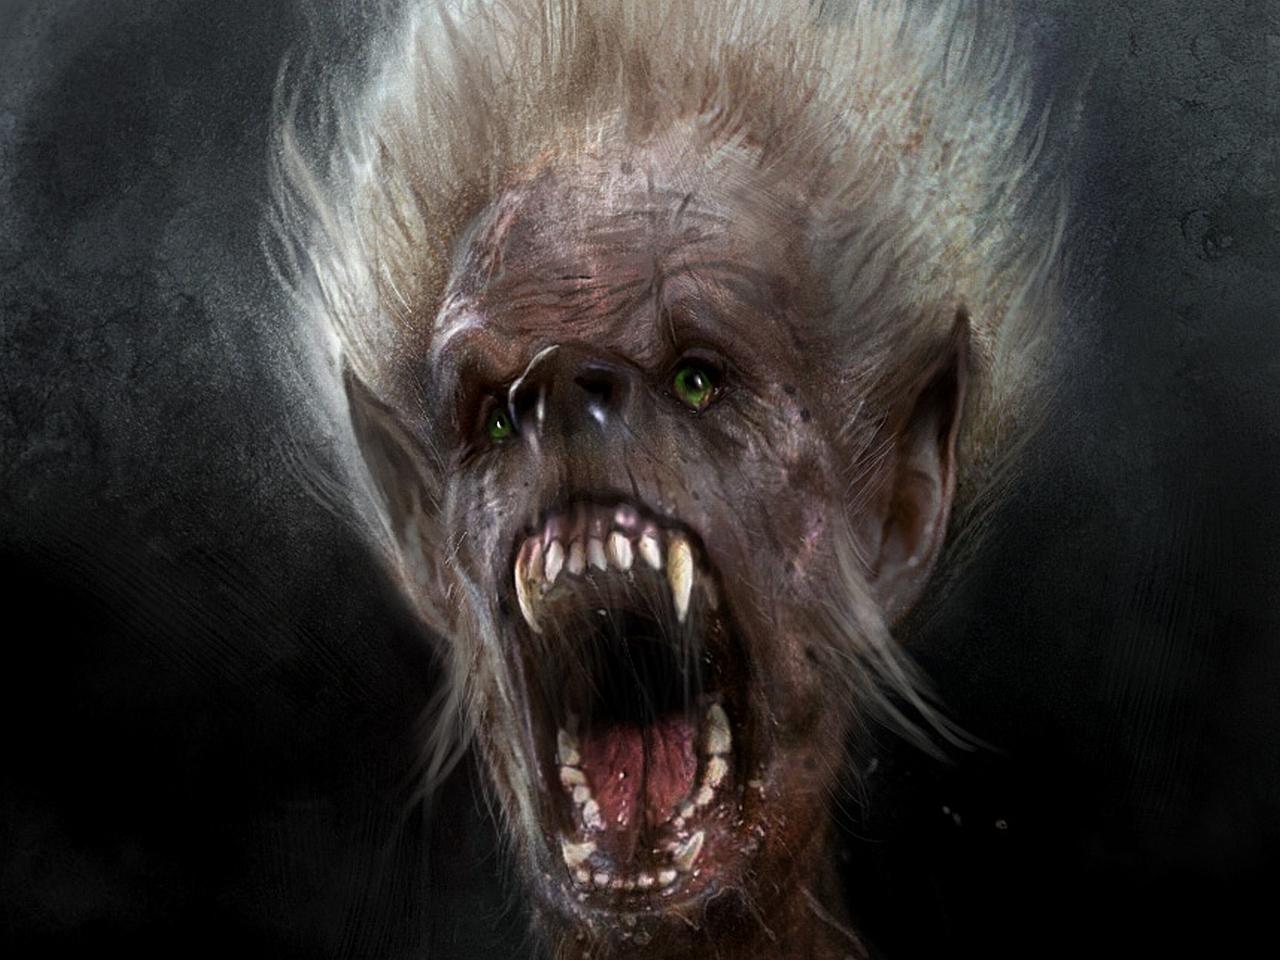 http://2.bp.blogspot.com/-LczPwCUkSrA/T-77vRHI9dI/AAAAAAAAEDI/vXug_3Tx8uw/s1600/dark-vampire_00223721.jpg